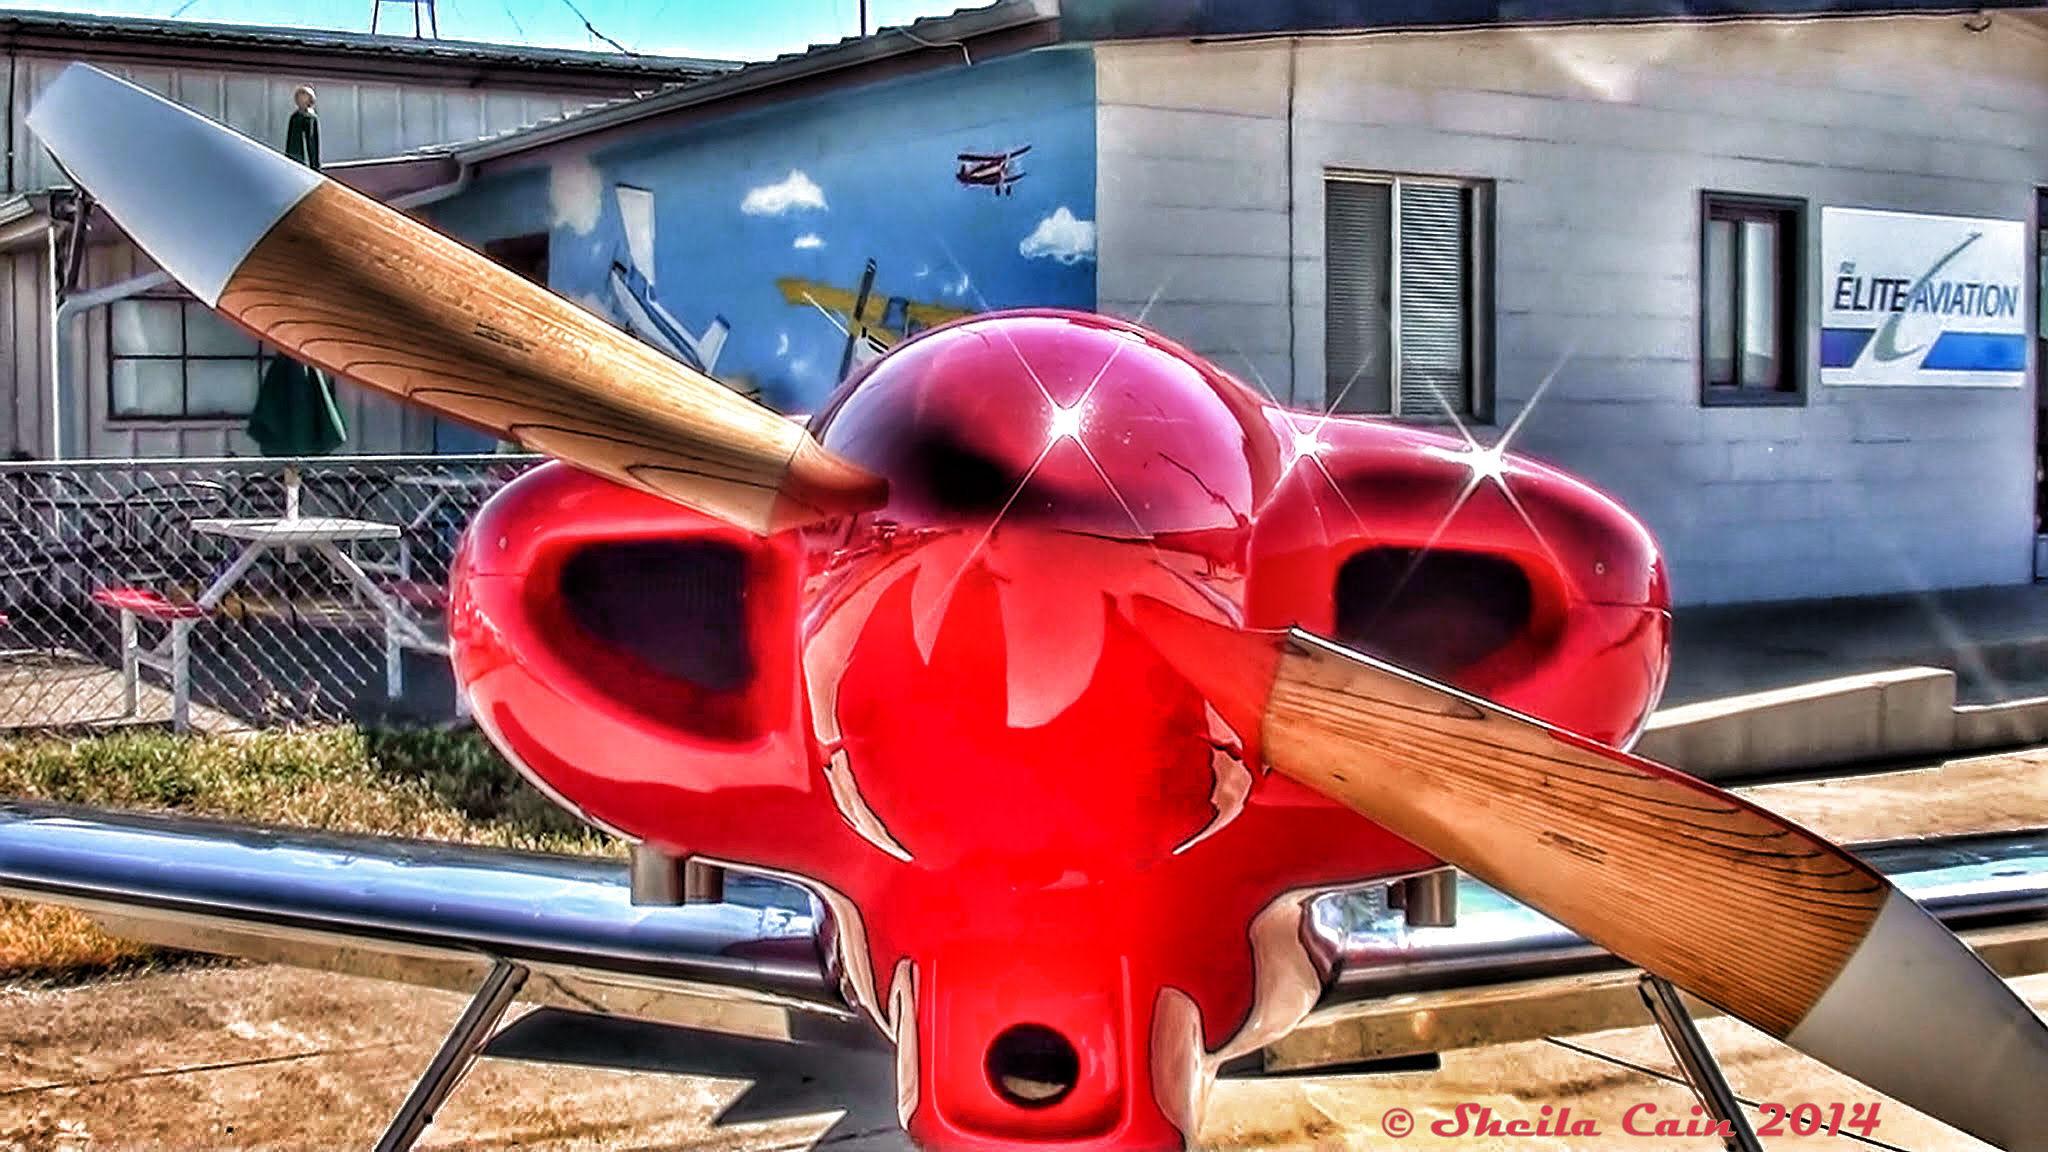 midget-mustang-home-built-aircraft-best-free-videos-tits